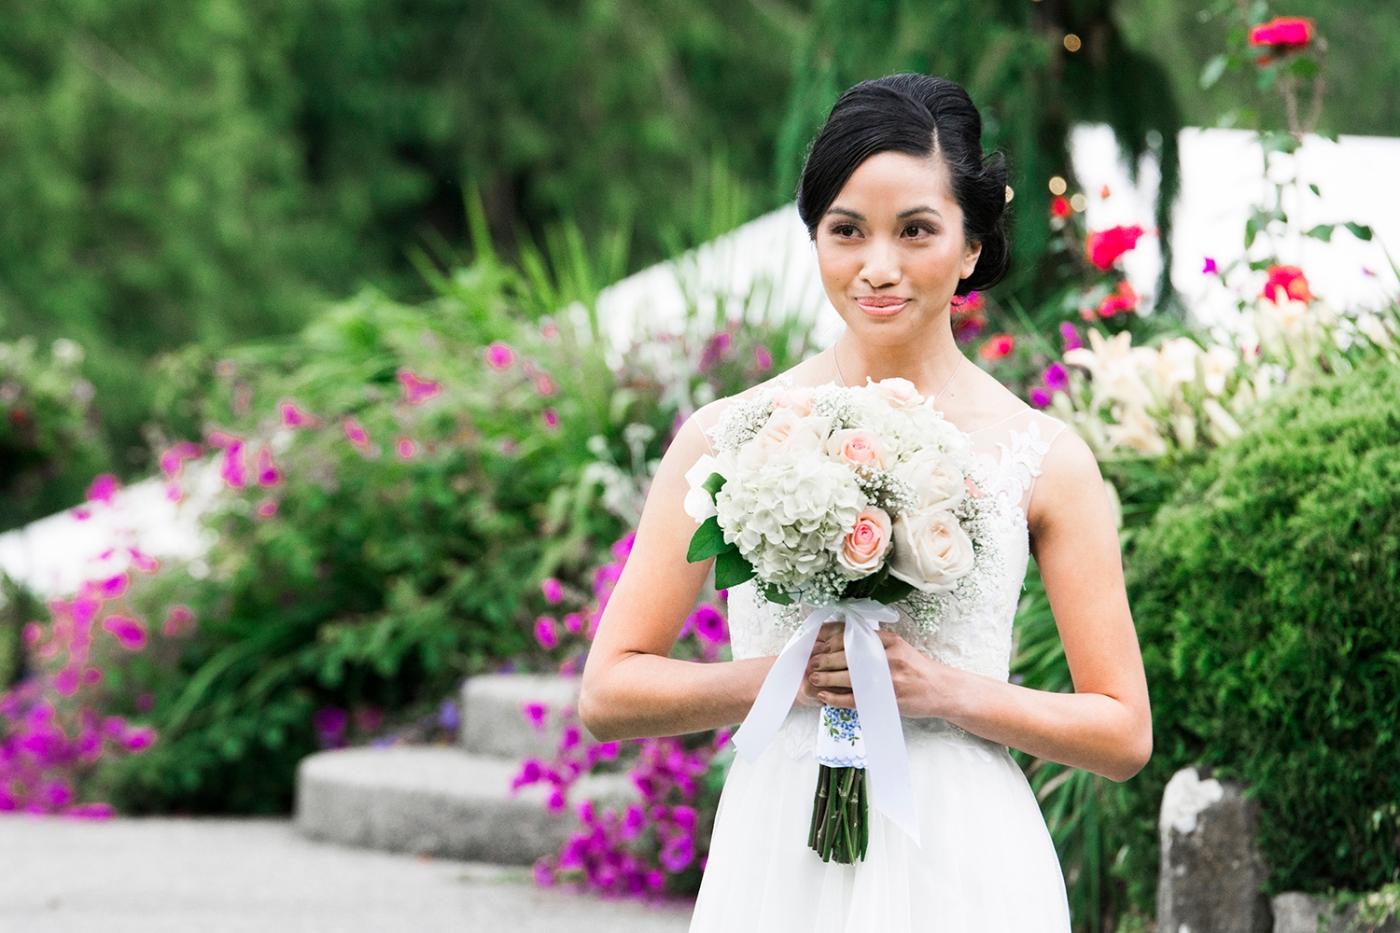 Jane_Speleers_2016_Details_Wedding_Wild_Rose_Estates_Venue_JS7_7754